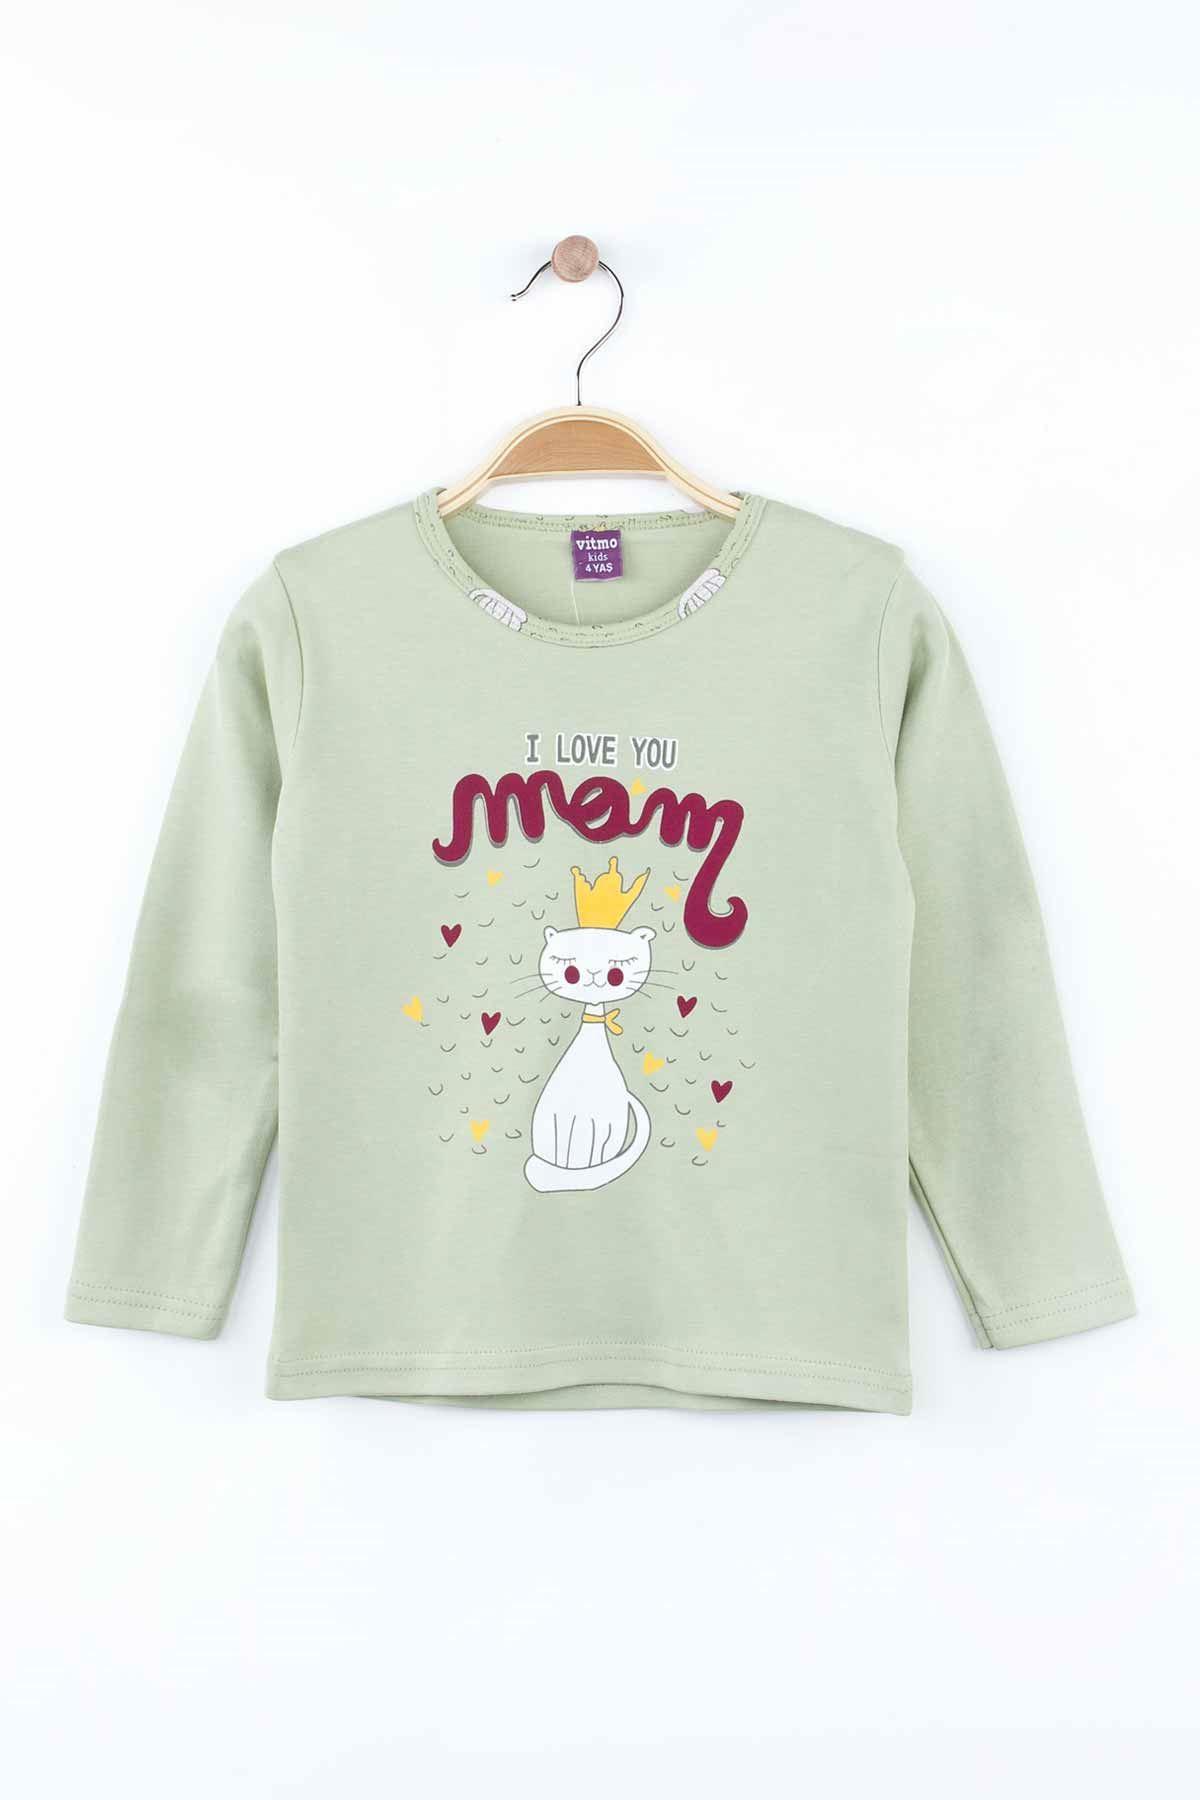 Green Girls Pajamas Set Bottom Pajamas Top Pajamas Kids Daily Wear Homewear Cotton Comfortable Children Pajamas Sets Models